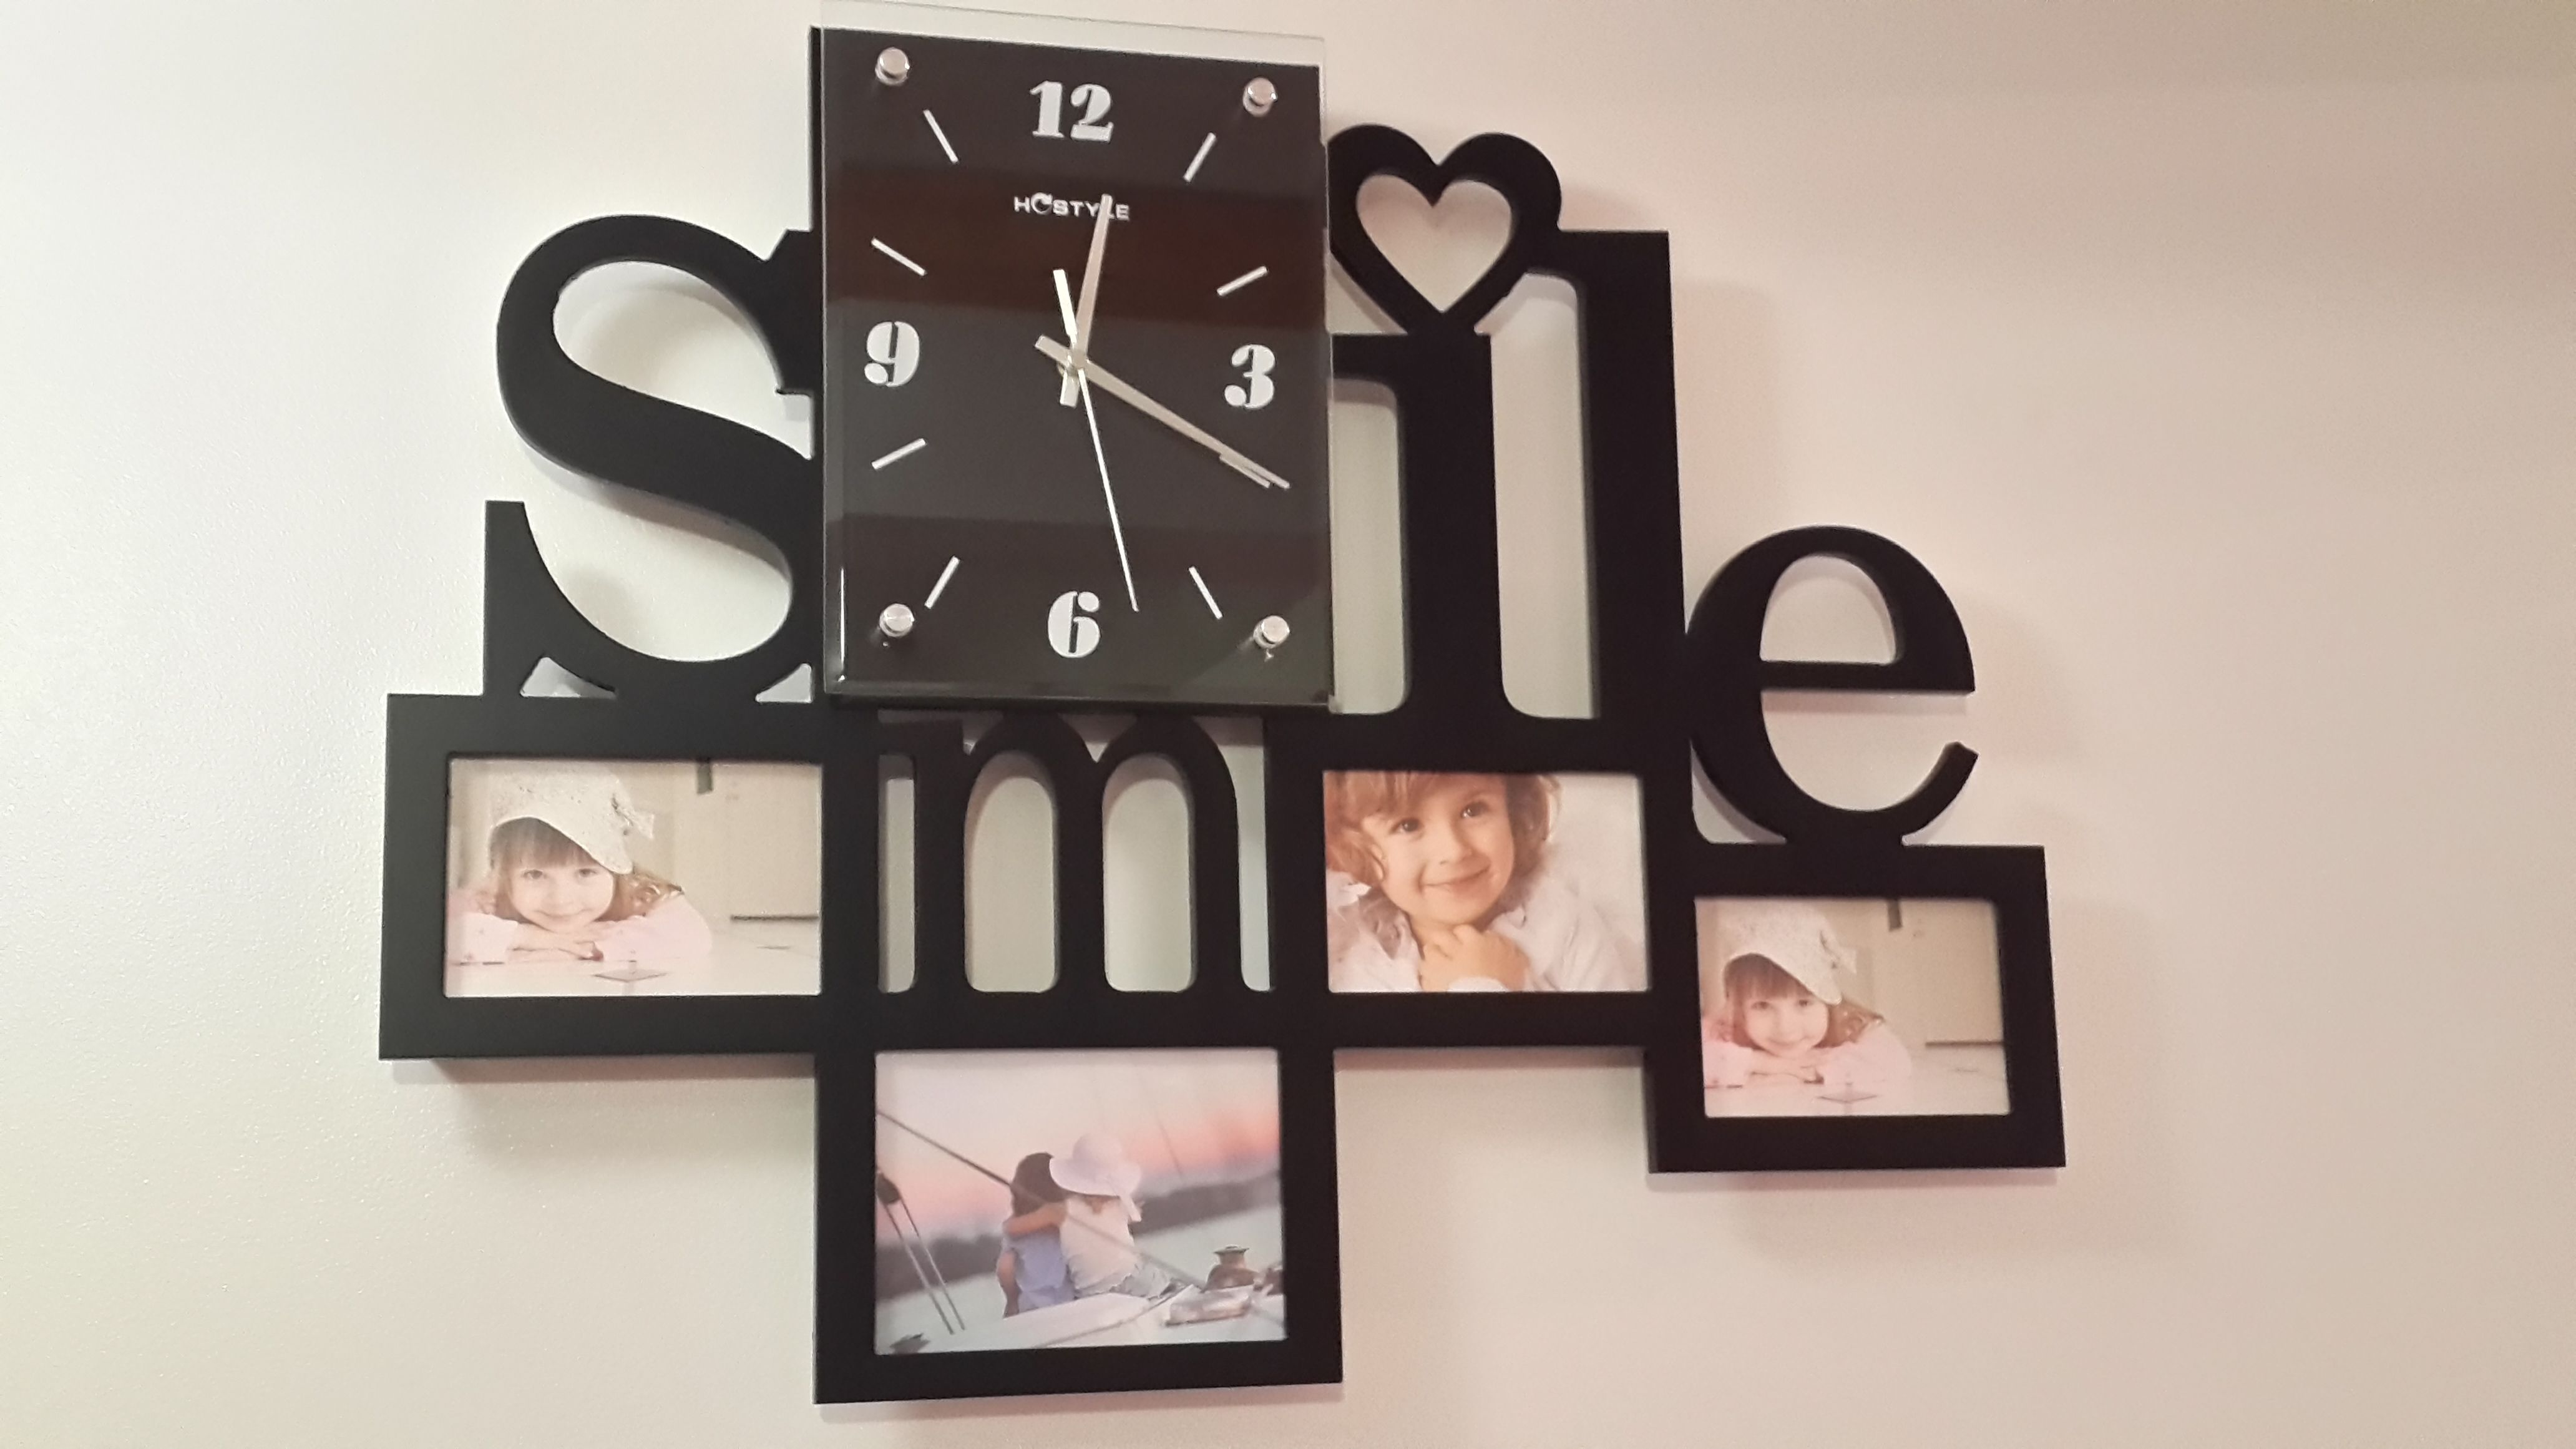 smile photo frame wall clock | modern wall clock | Pinterest | Smile ...